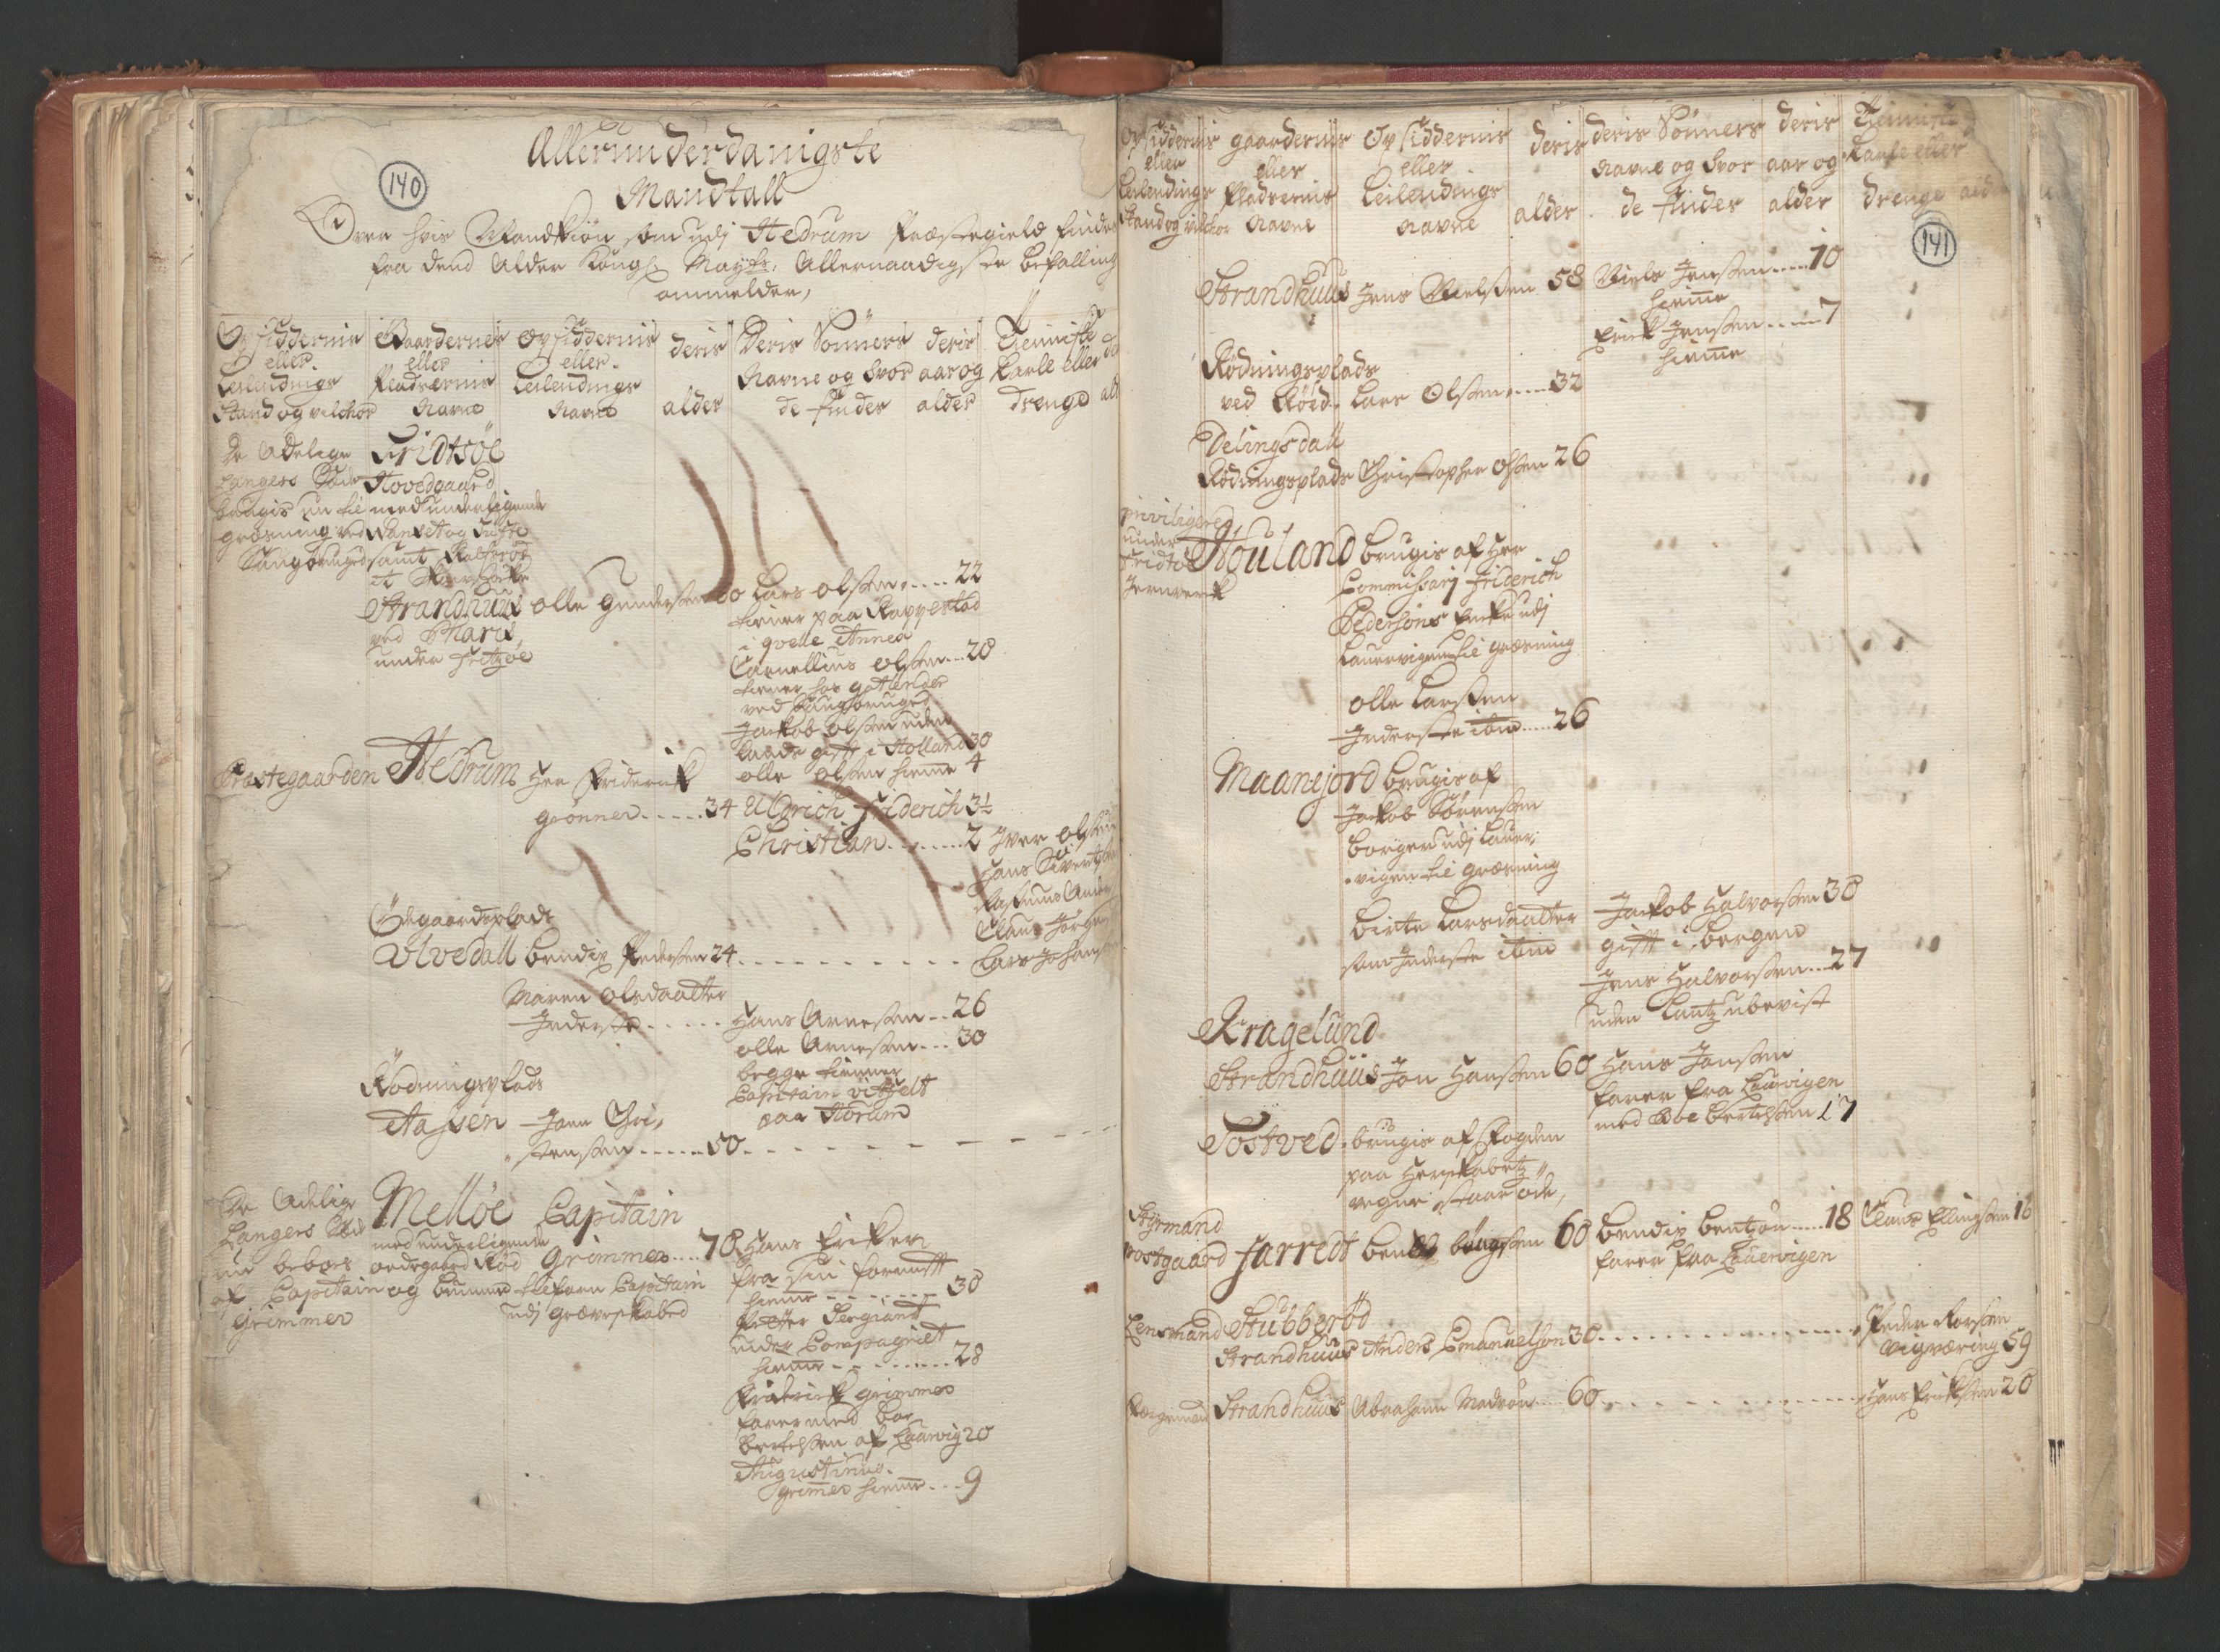 RA, Manntallet 1701, nr. 2: Solør, Odal og Østerdal fogderi og Larvik grevskap, 1701, s. 140-141